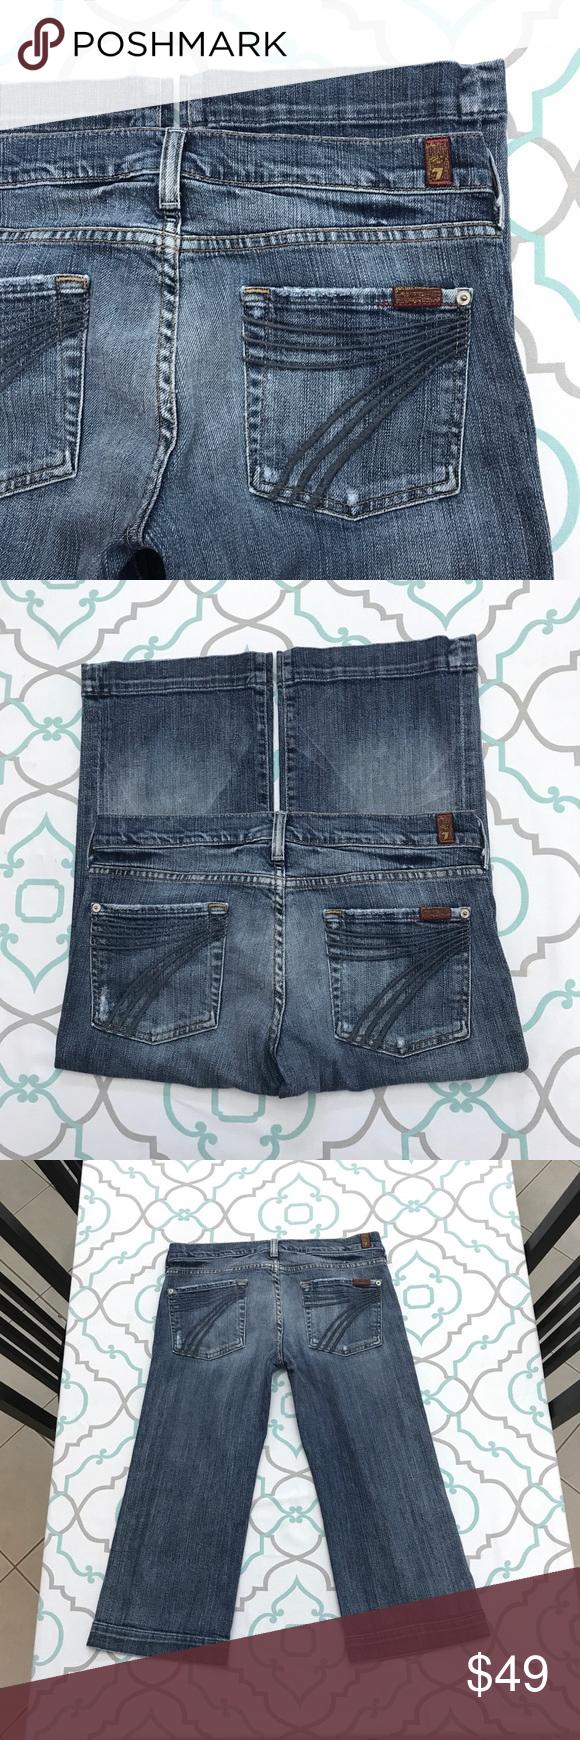 Awesome 7fam Dojo Crops 30 9 10 Distressed Leggings Are Not Pants Premium Denim Clothes Design